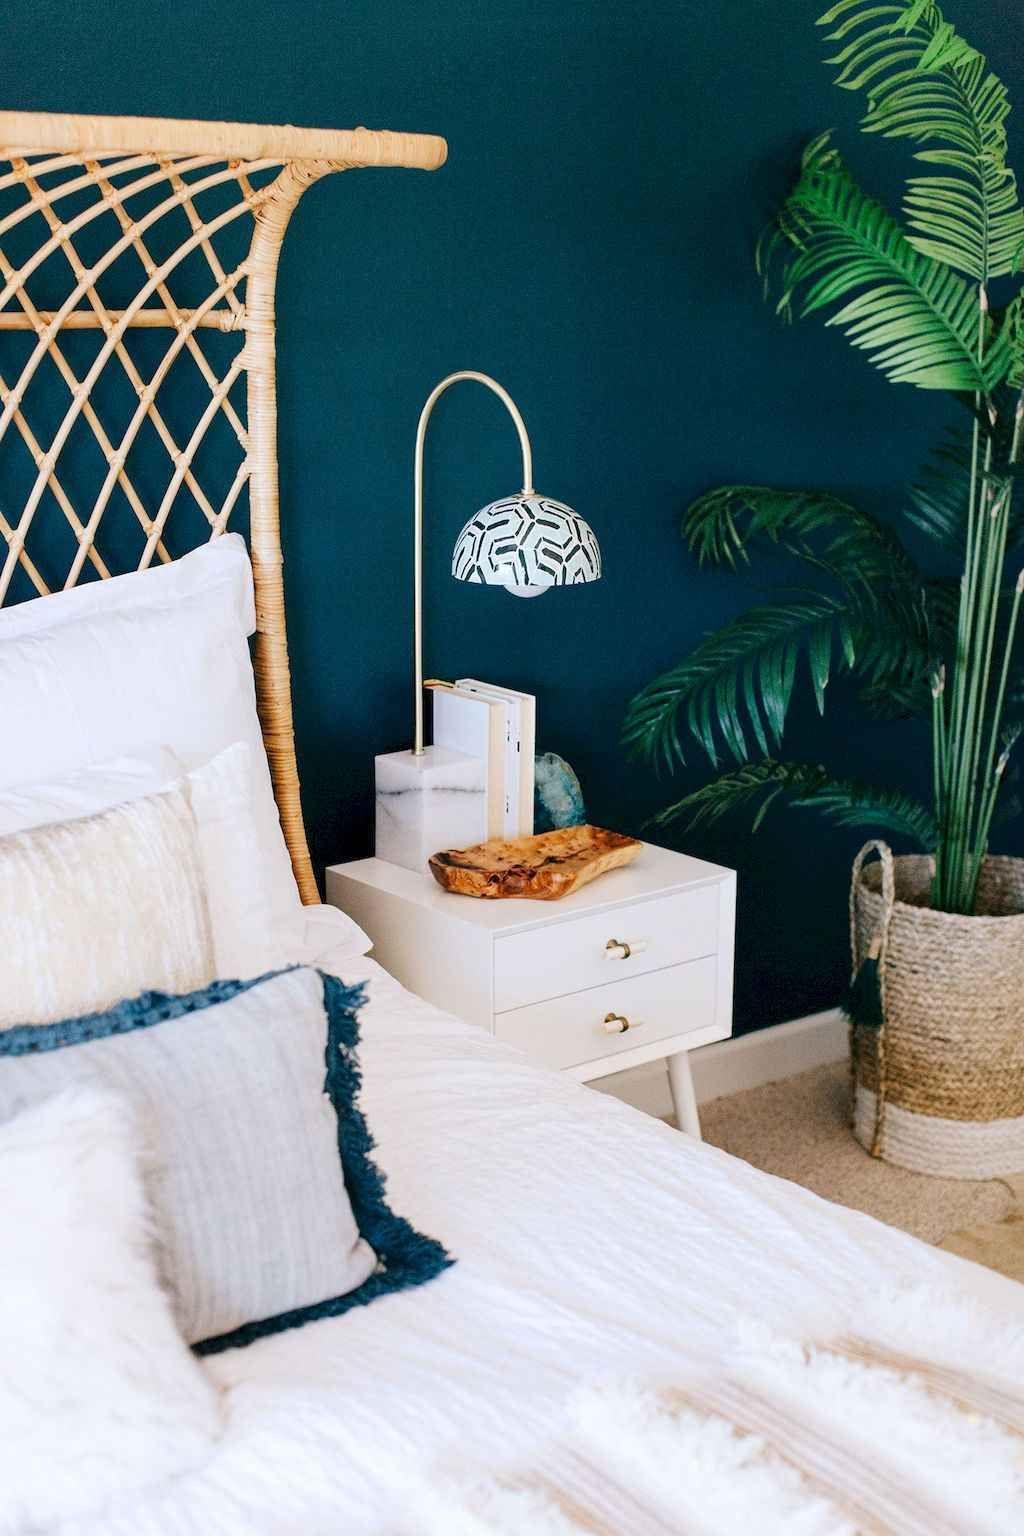 75 Inspiration Modern Bohemian Bedroom Ideas #modernbohemianbedrooms